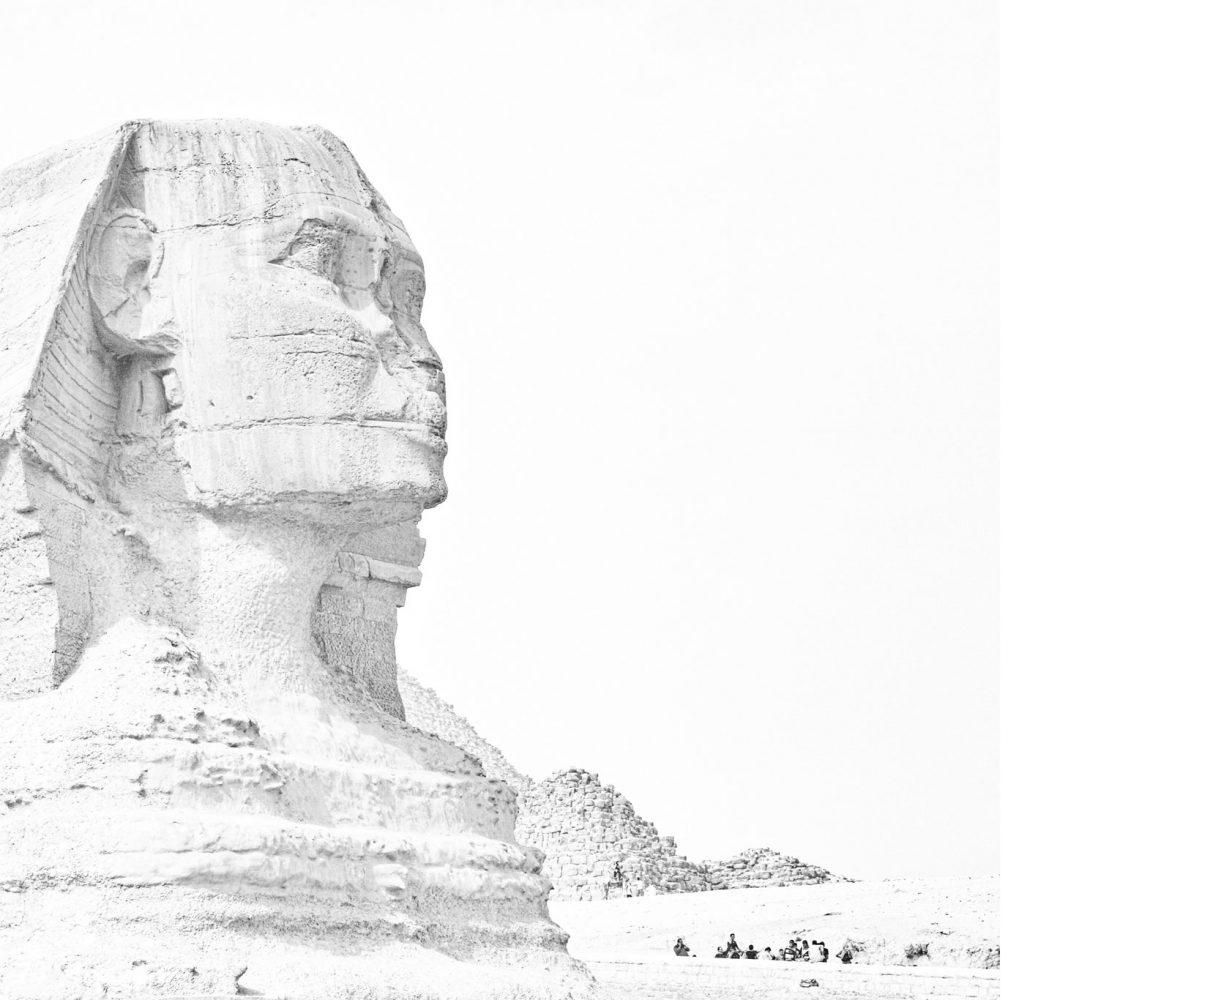 egypt_b&w_thevoyageur25